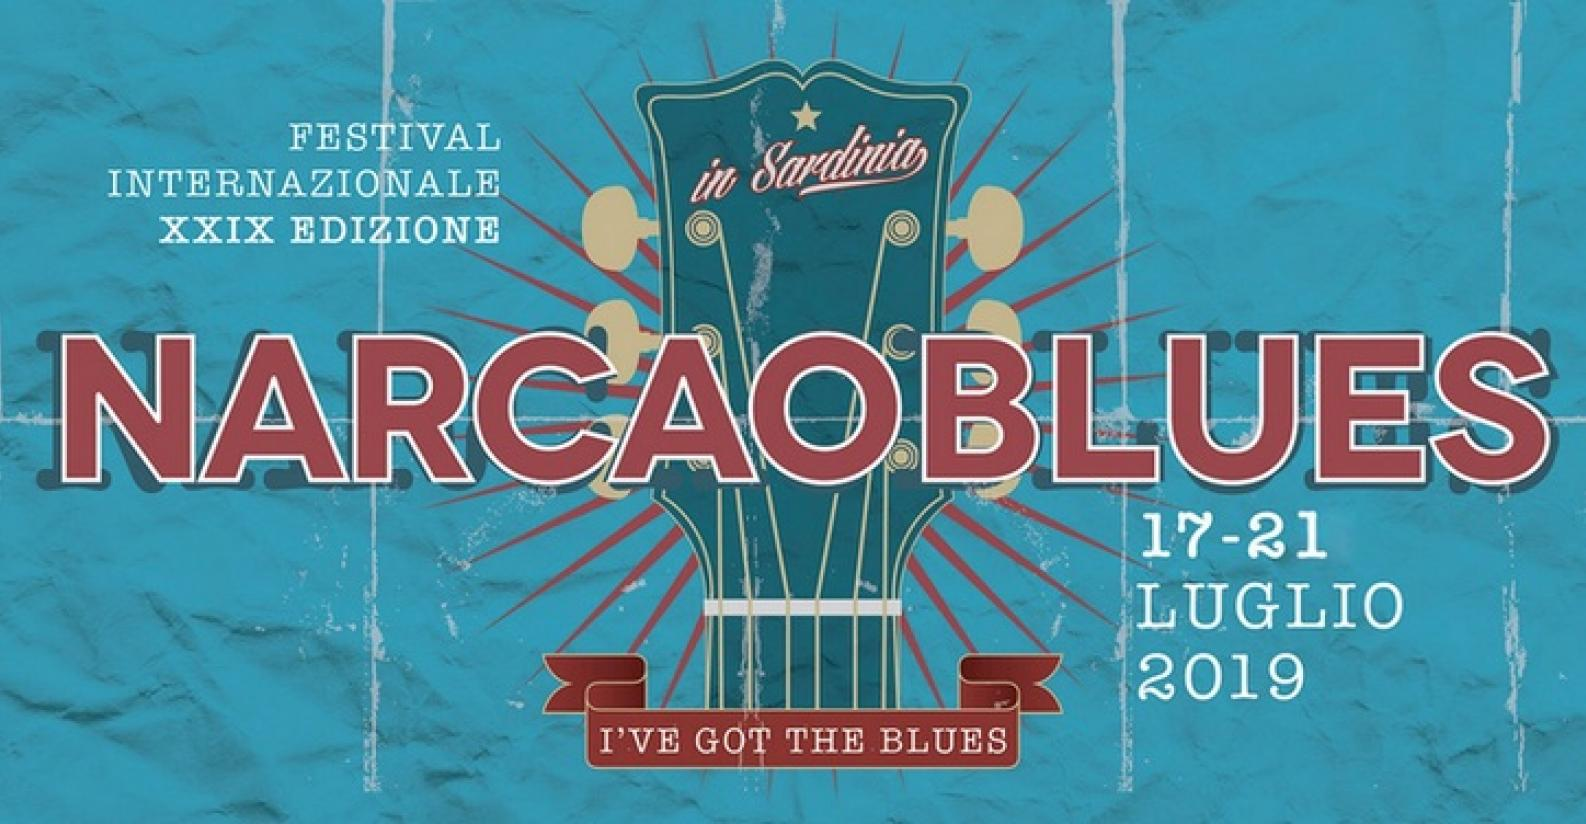 Narcao Blues 2019